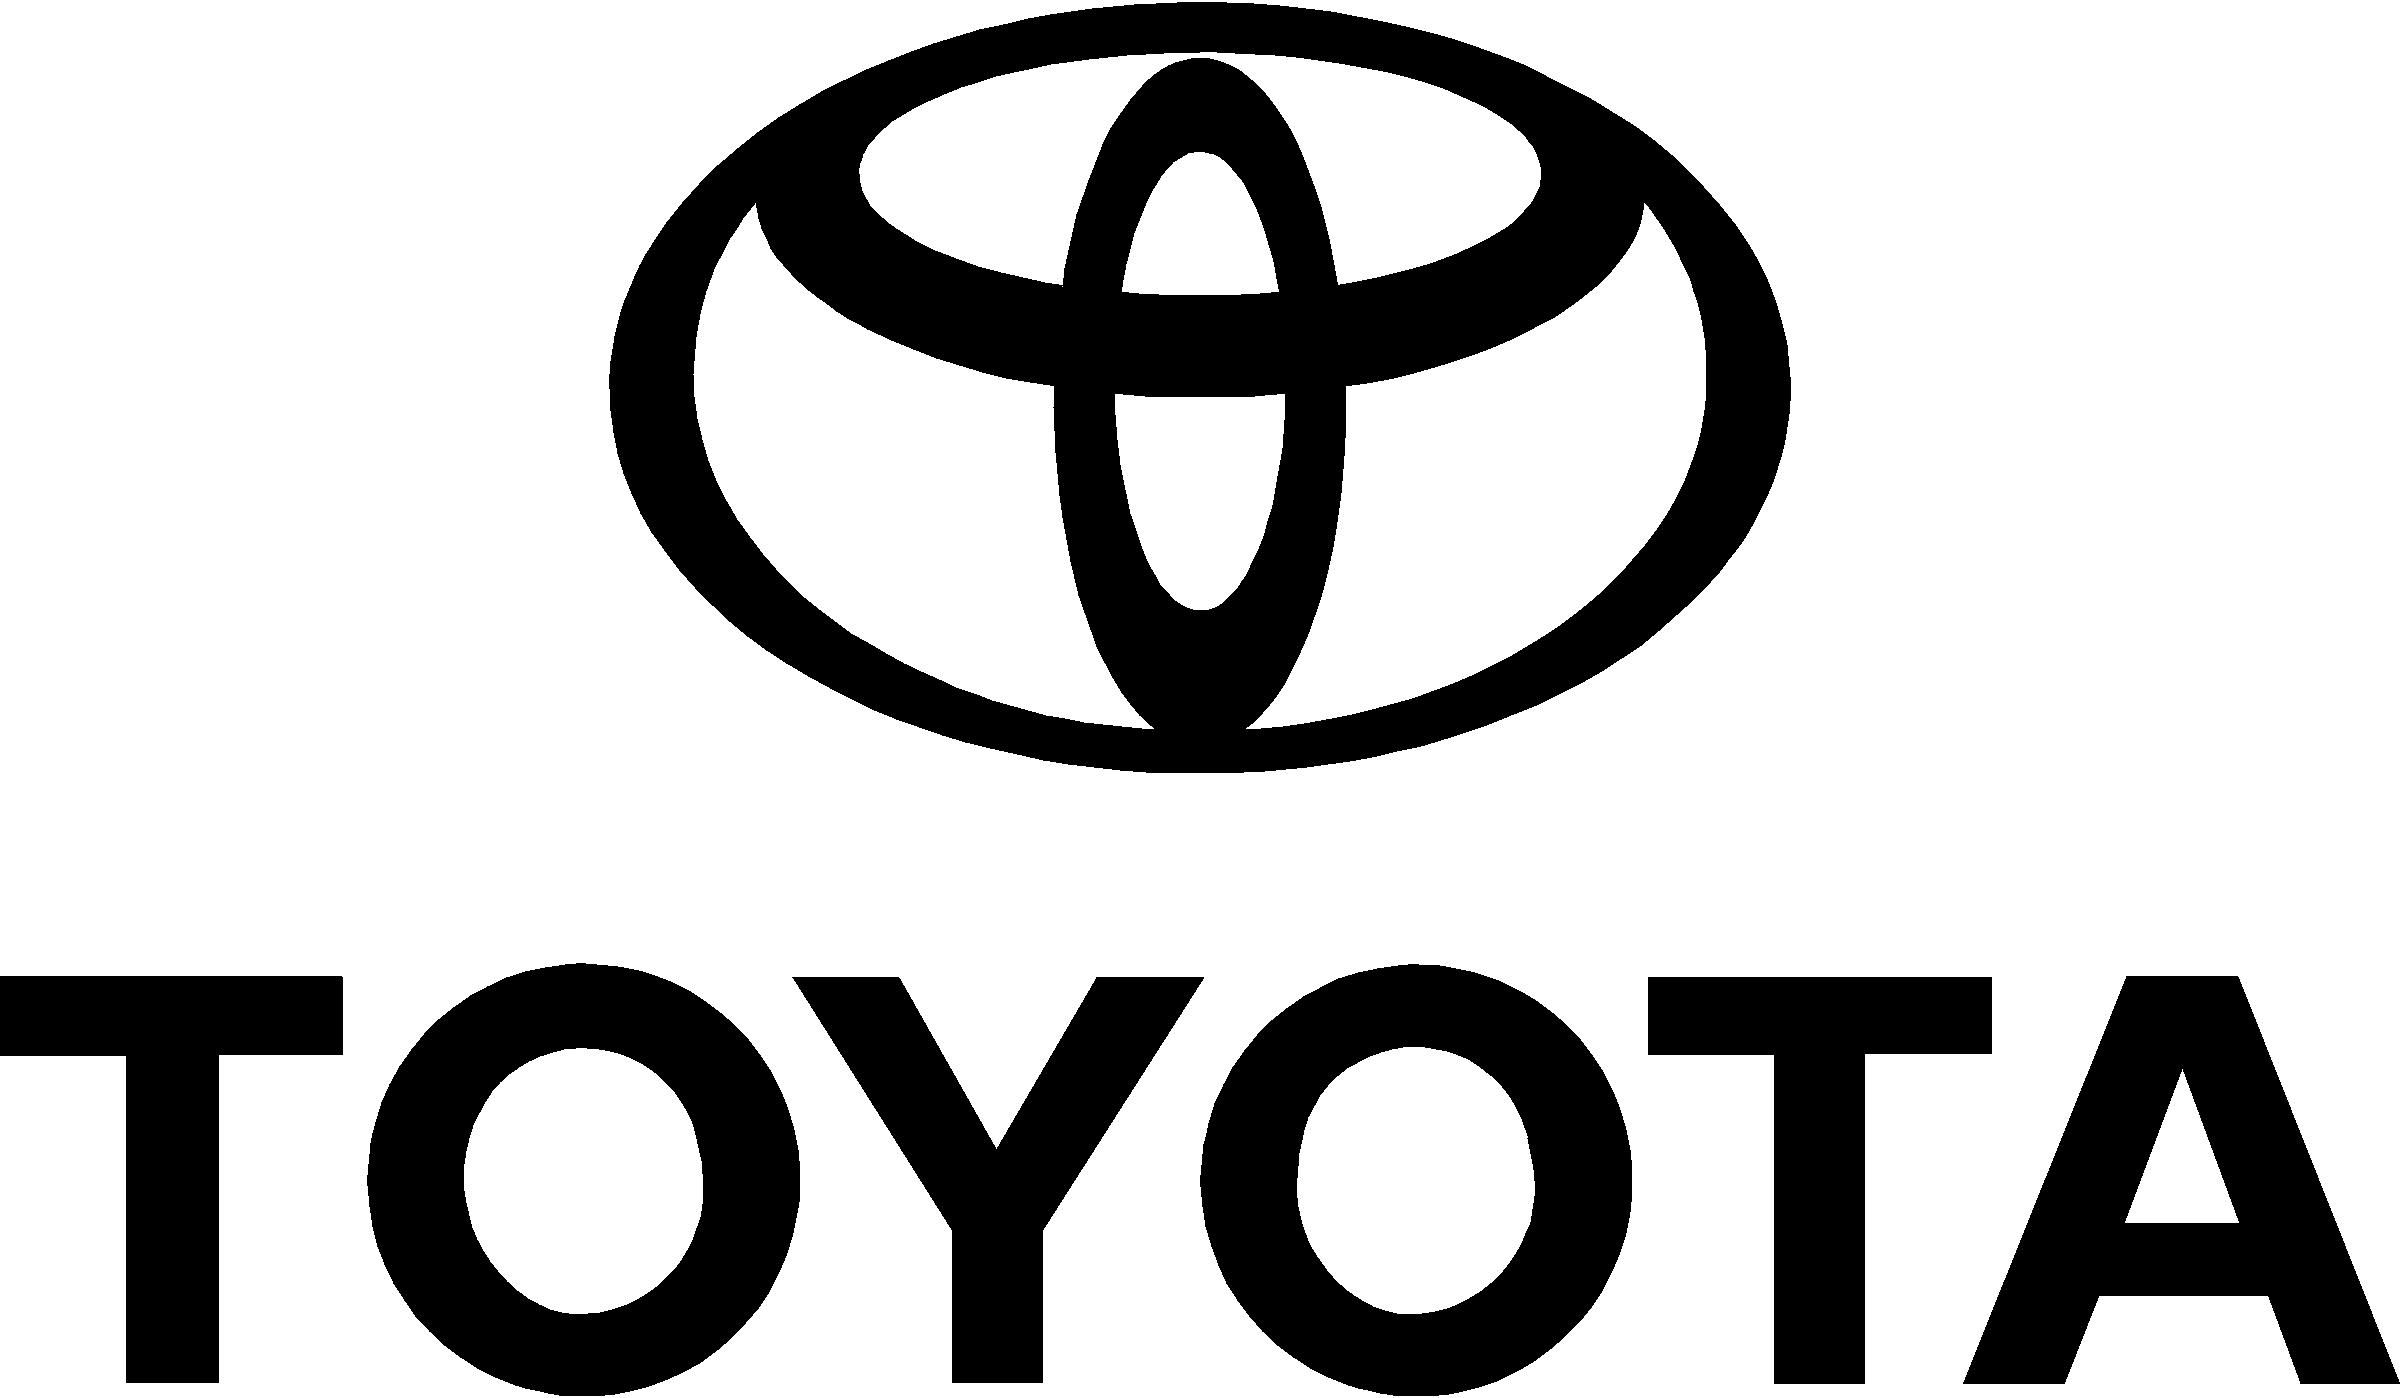 Pin by Corey Jones on NASCAR Toyota, Logos, Nascar